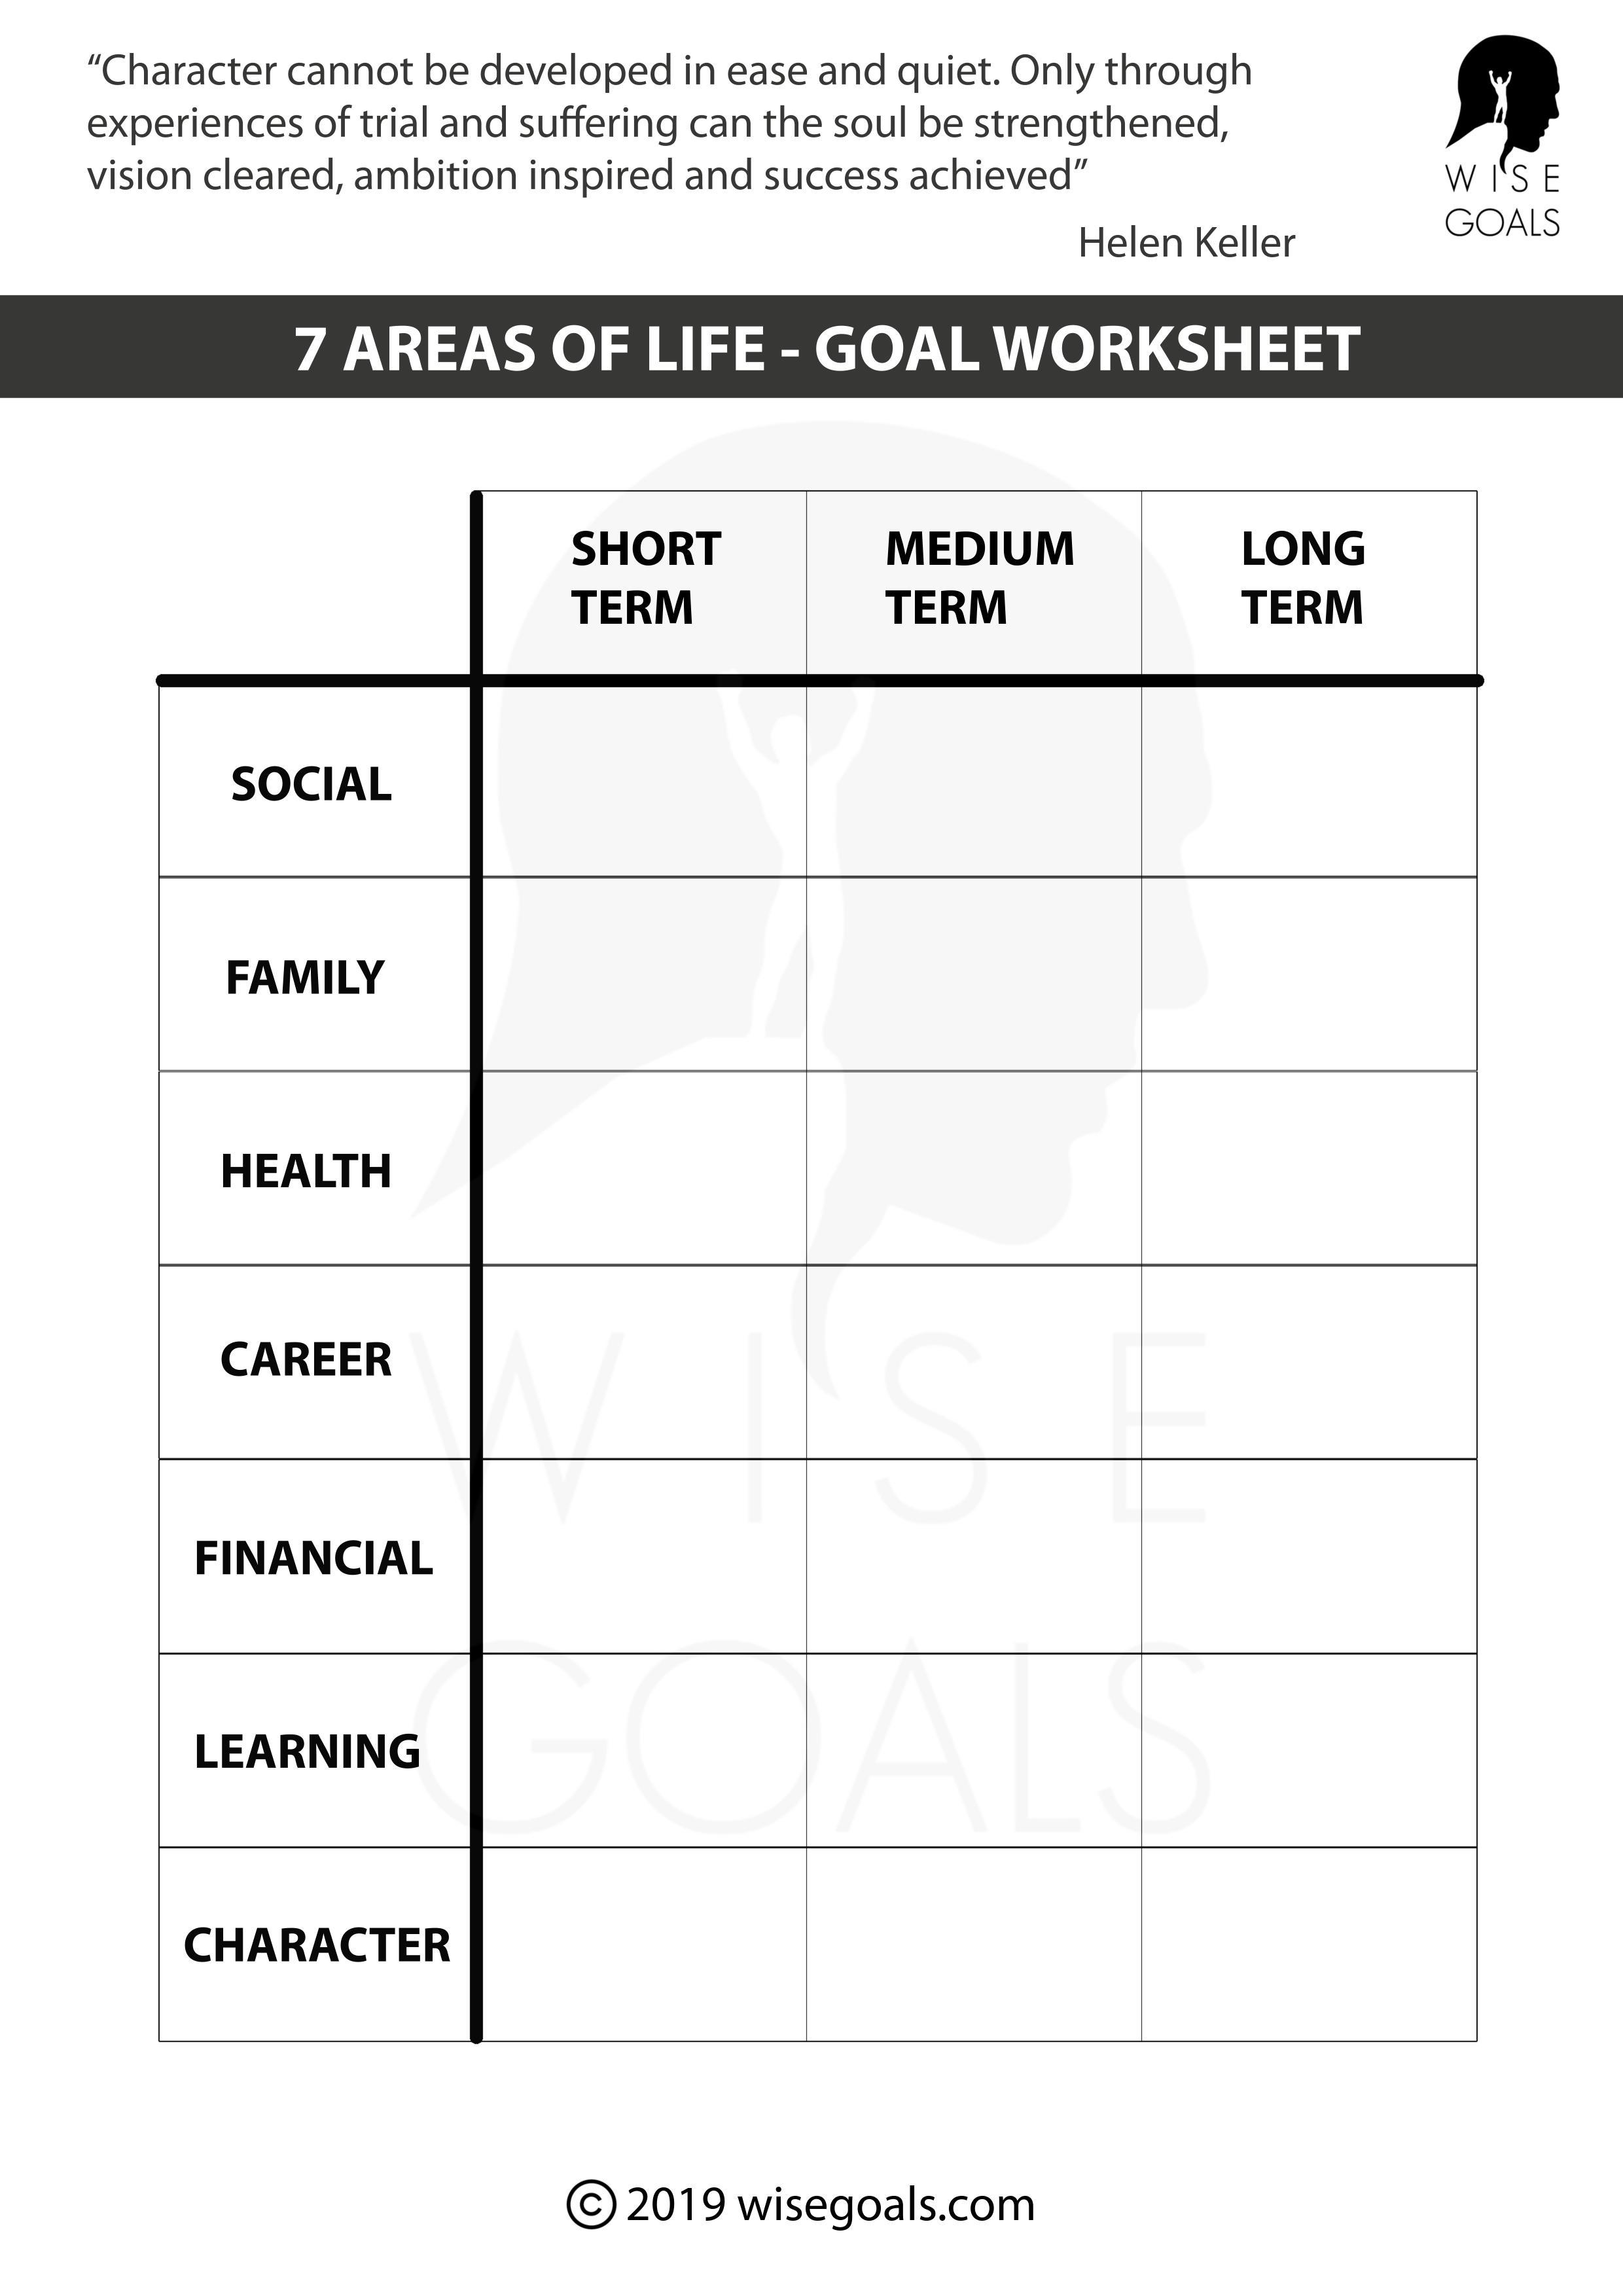 Stylish Goal Setting Worksheets To Print Pdf Free